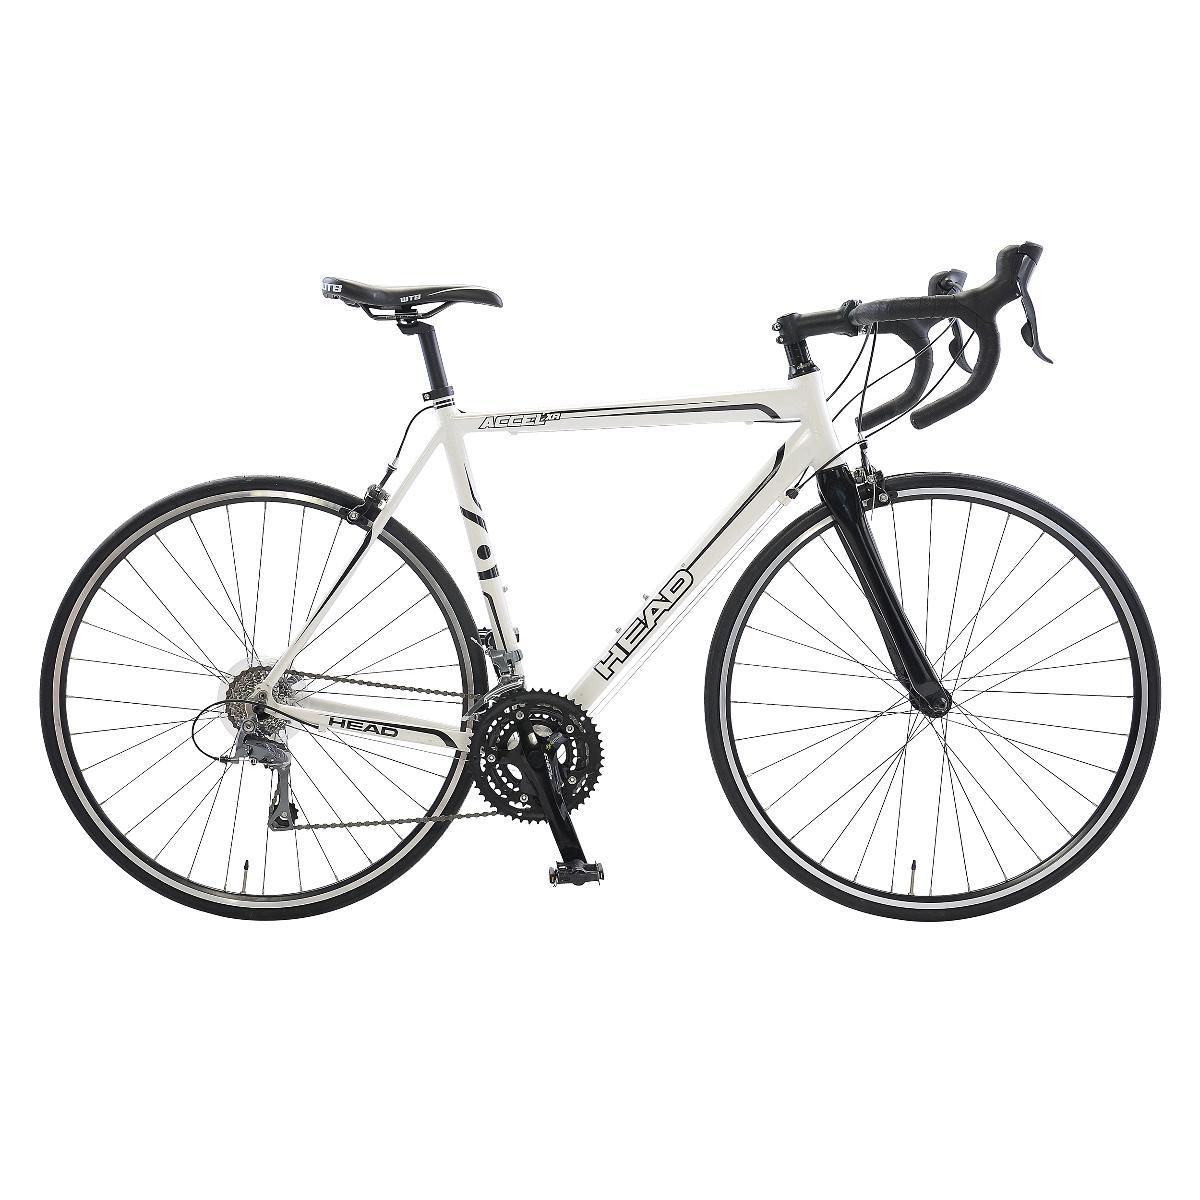 Head Bicycle Accel XR 700C Road Bicycle